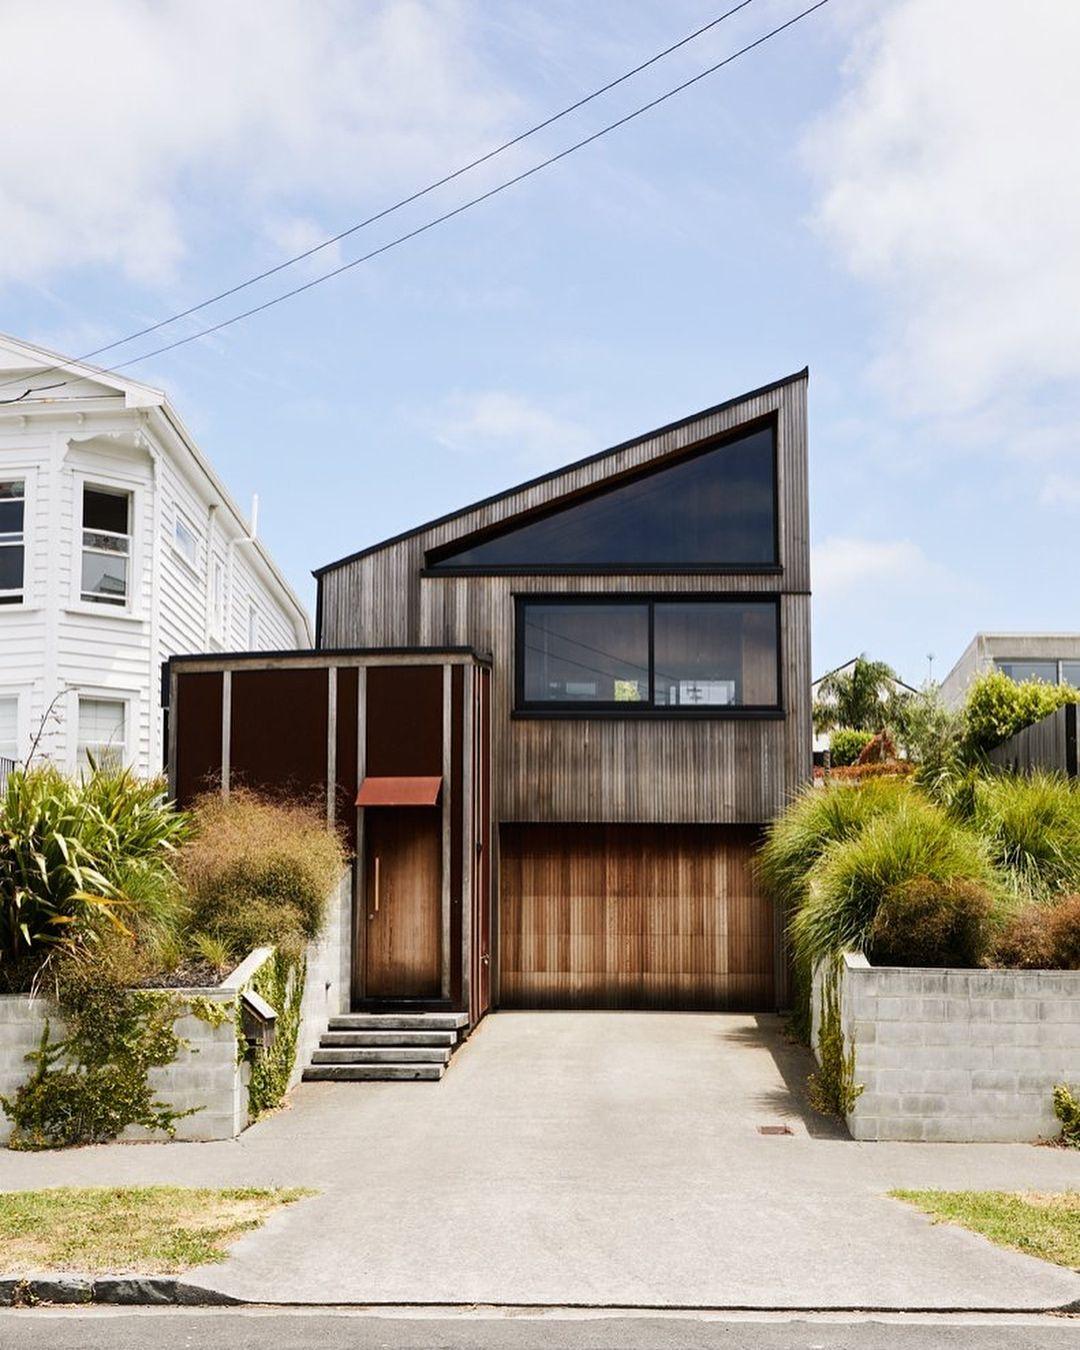 Pergola Designs New Zealand: This New Zealand Home Looks Like A Tiny Village. Designed